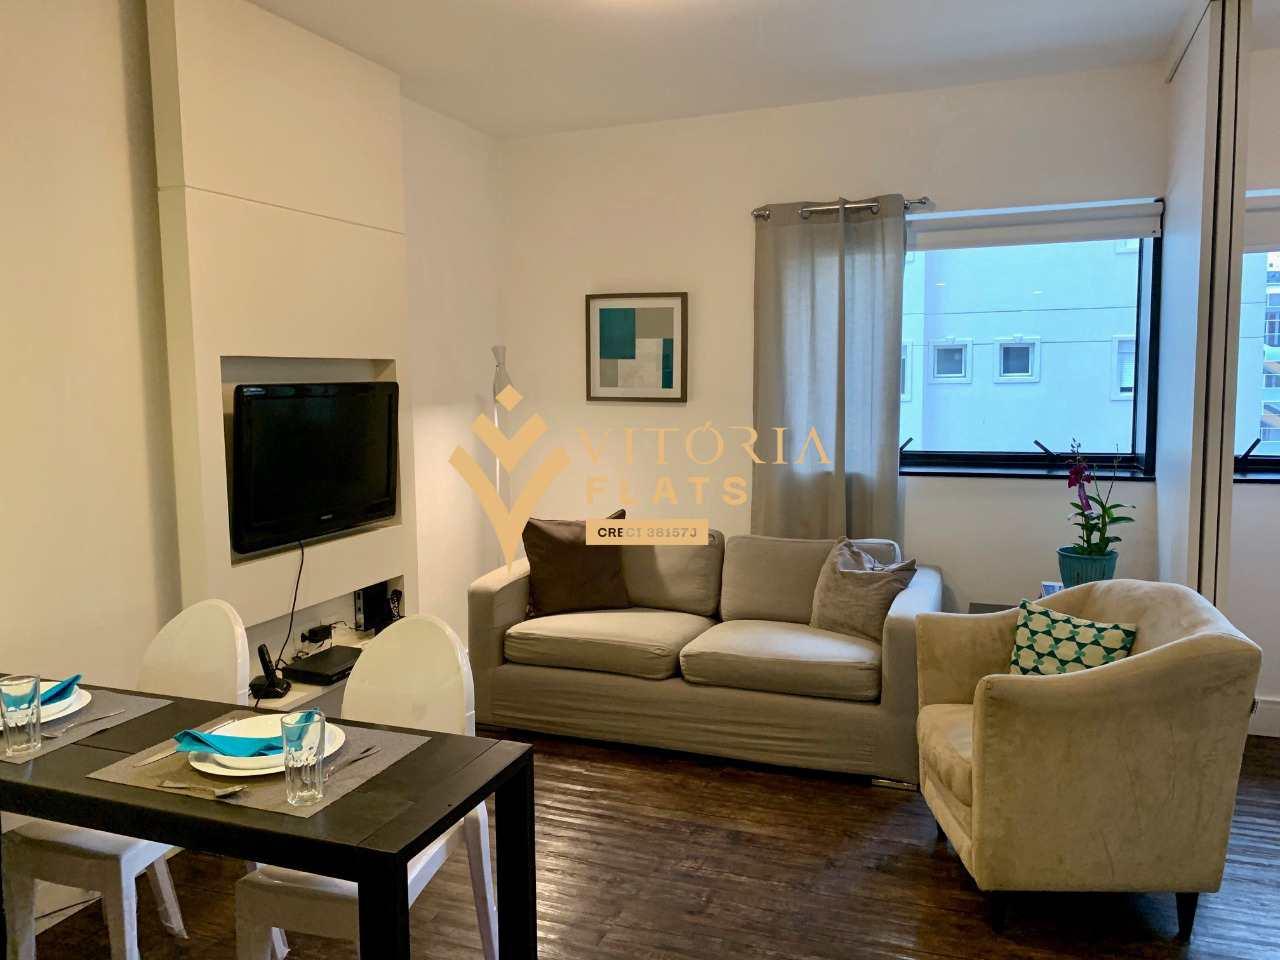 Flat com 1 dorm, Jardim Paulista, São Paulo, Cod: 64426945